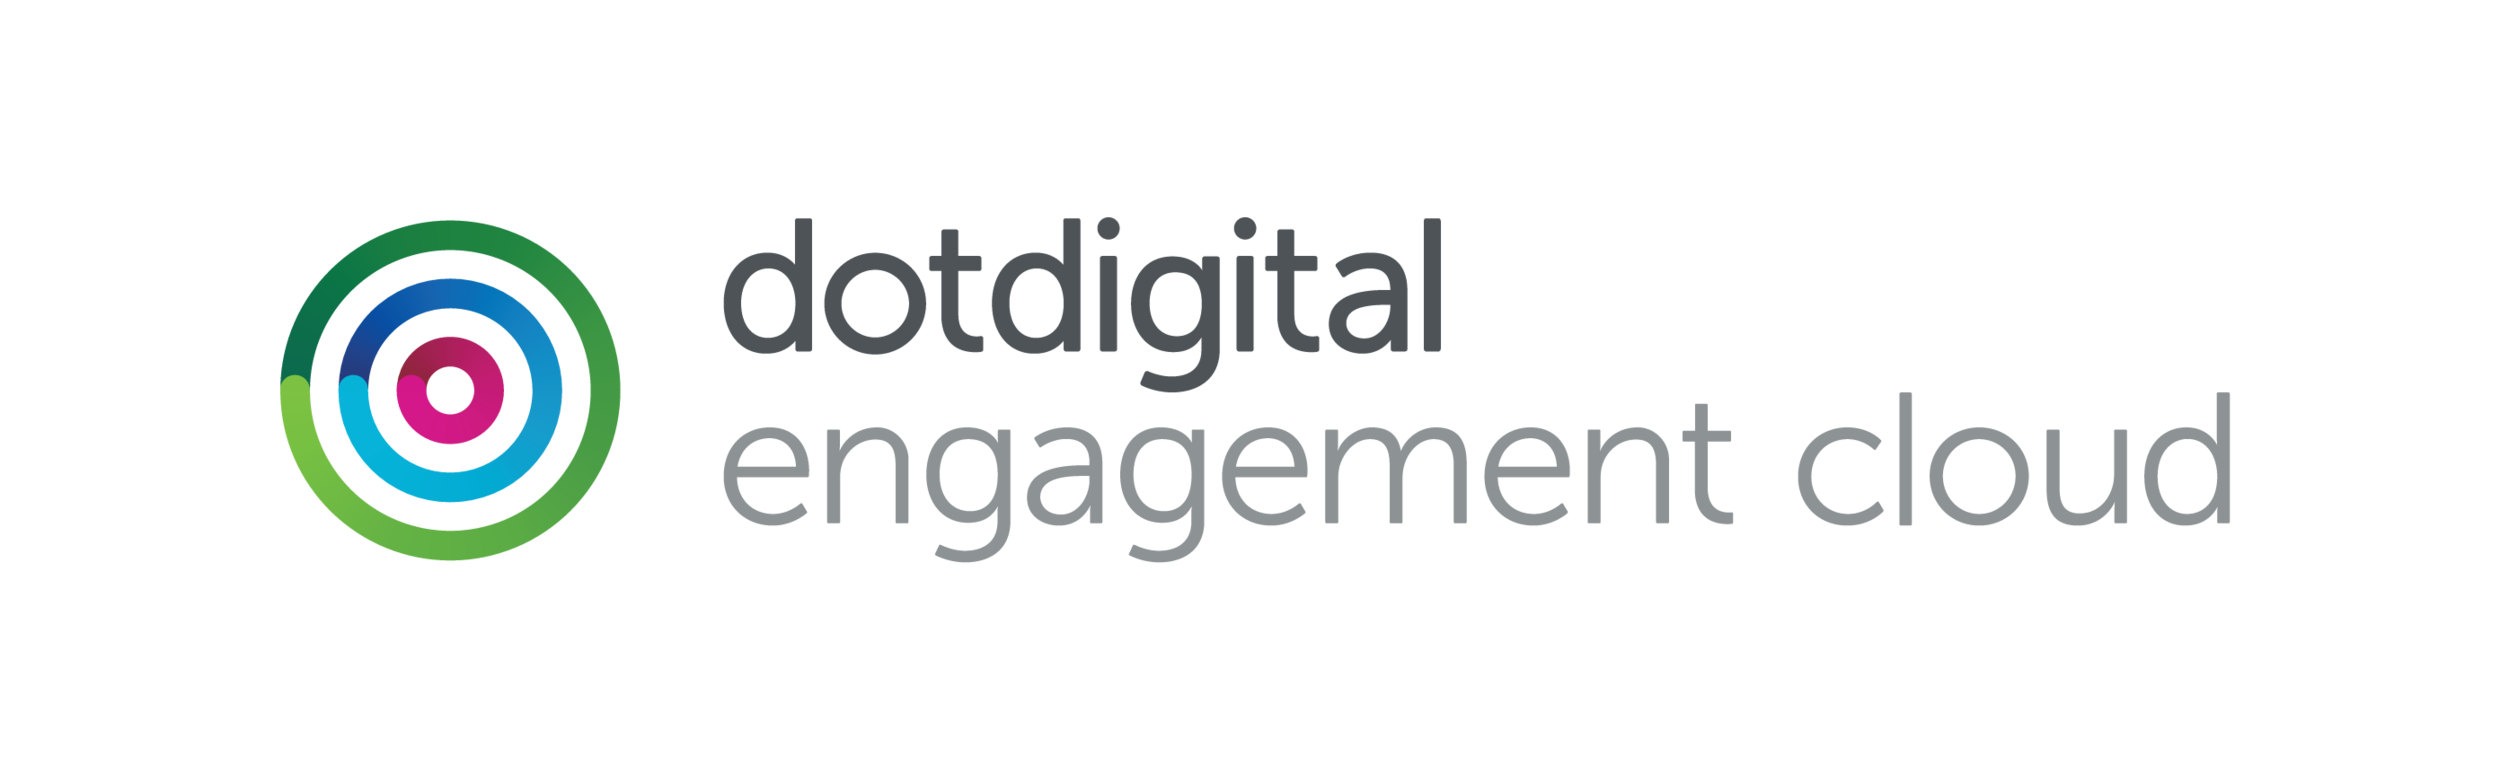 dotdigital-engagement-cloud-logo_rgb.png